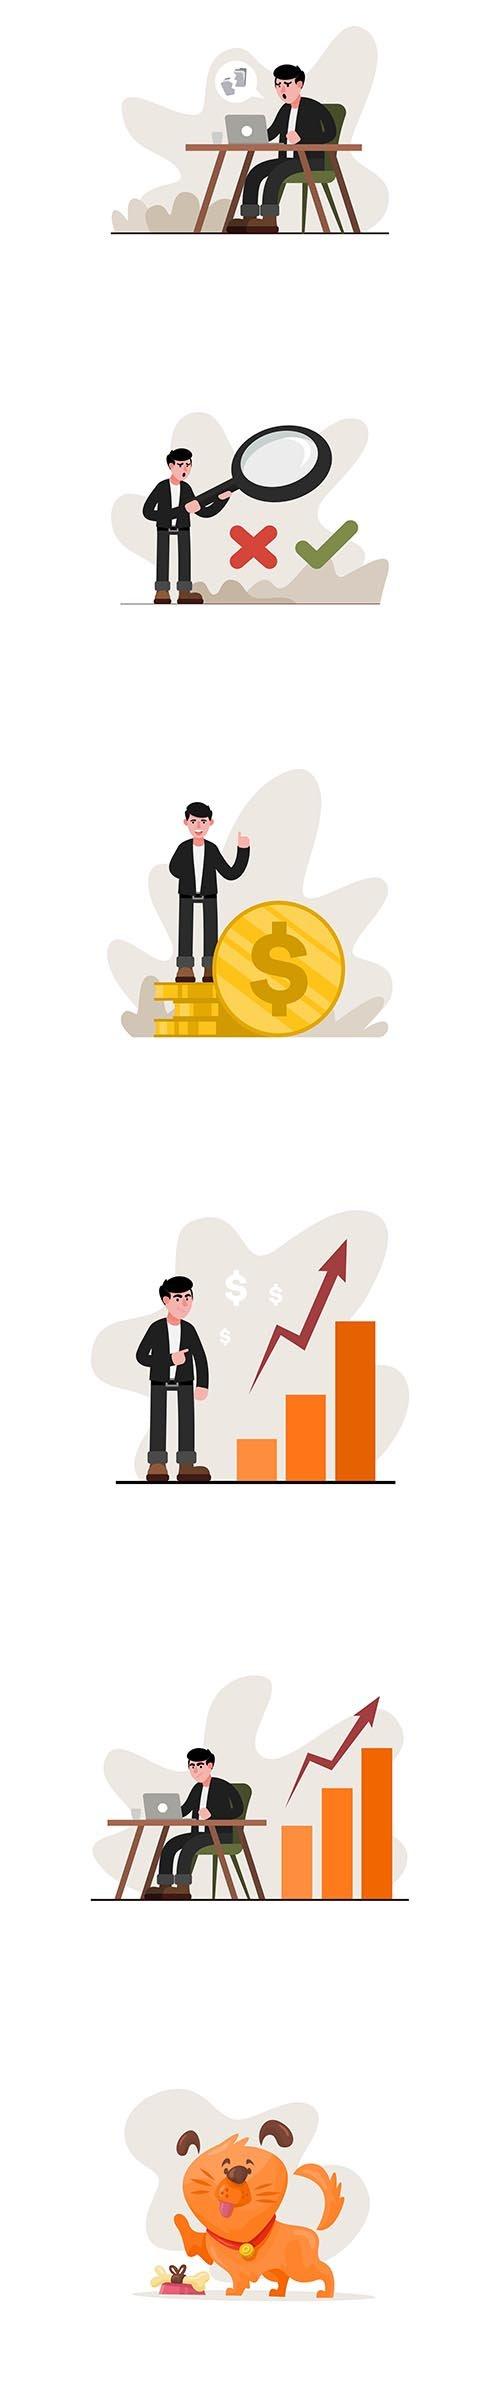 Working to increase profits